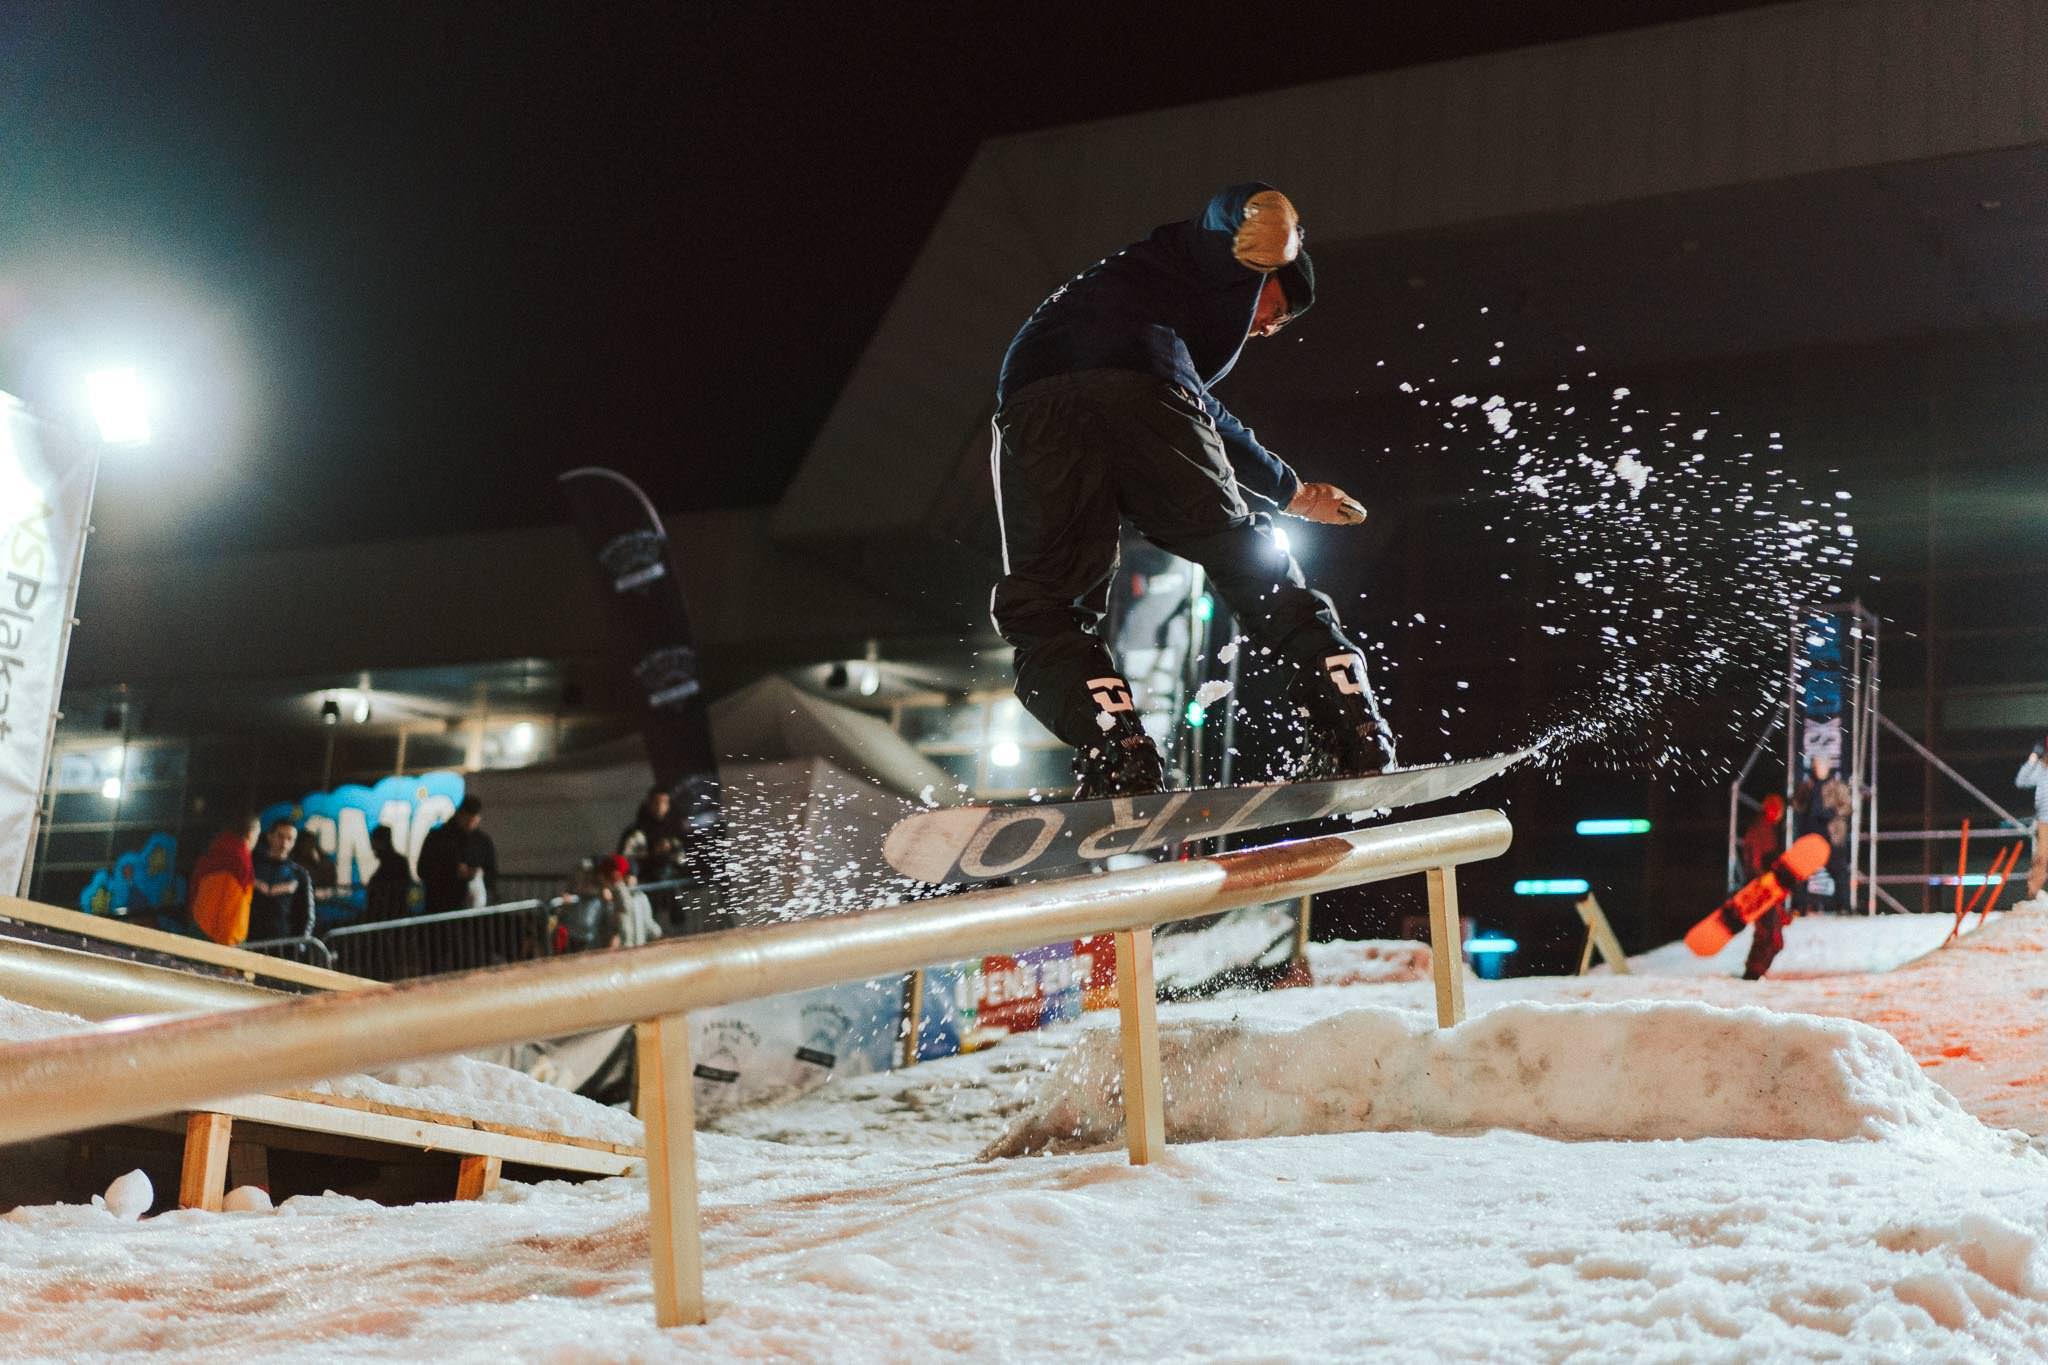 Avalanche Risk City Jam3